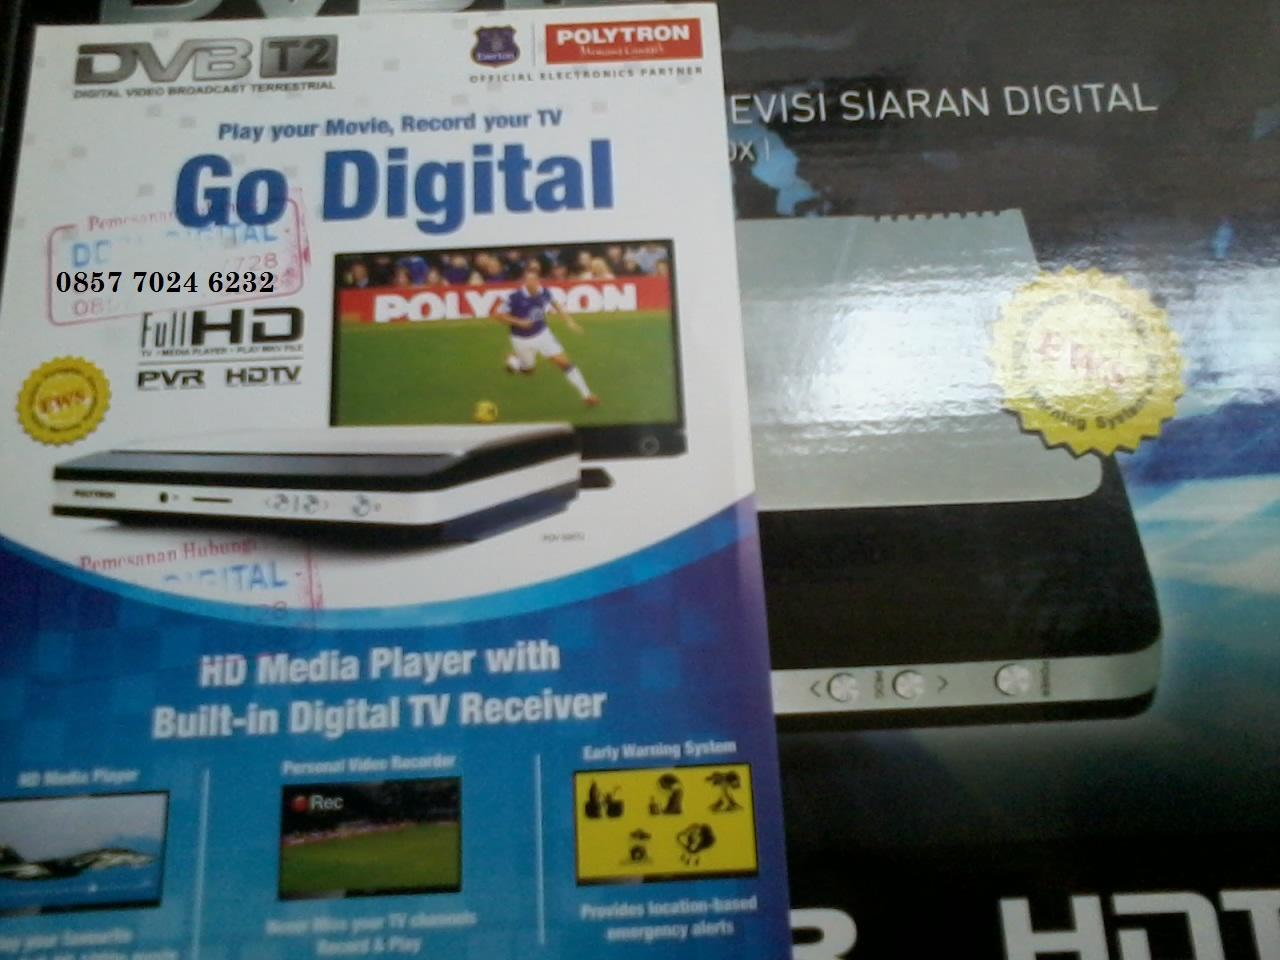 SET TOP BOX SIARAN TV DIGITAL TANPA SEMUT POLYTRON DVBT2 - COD TANGERANG & JAKARTA